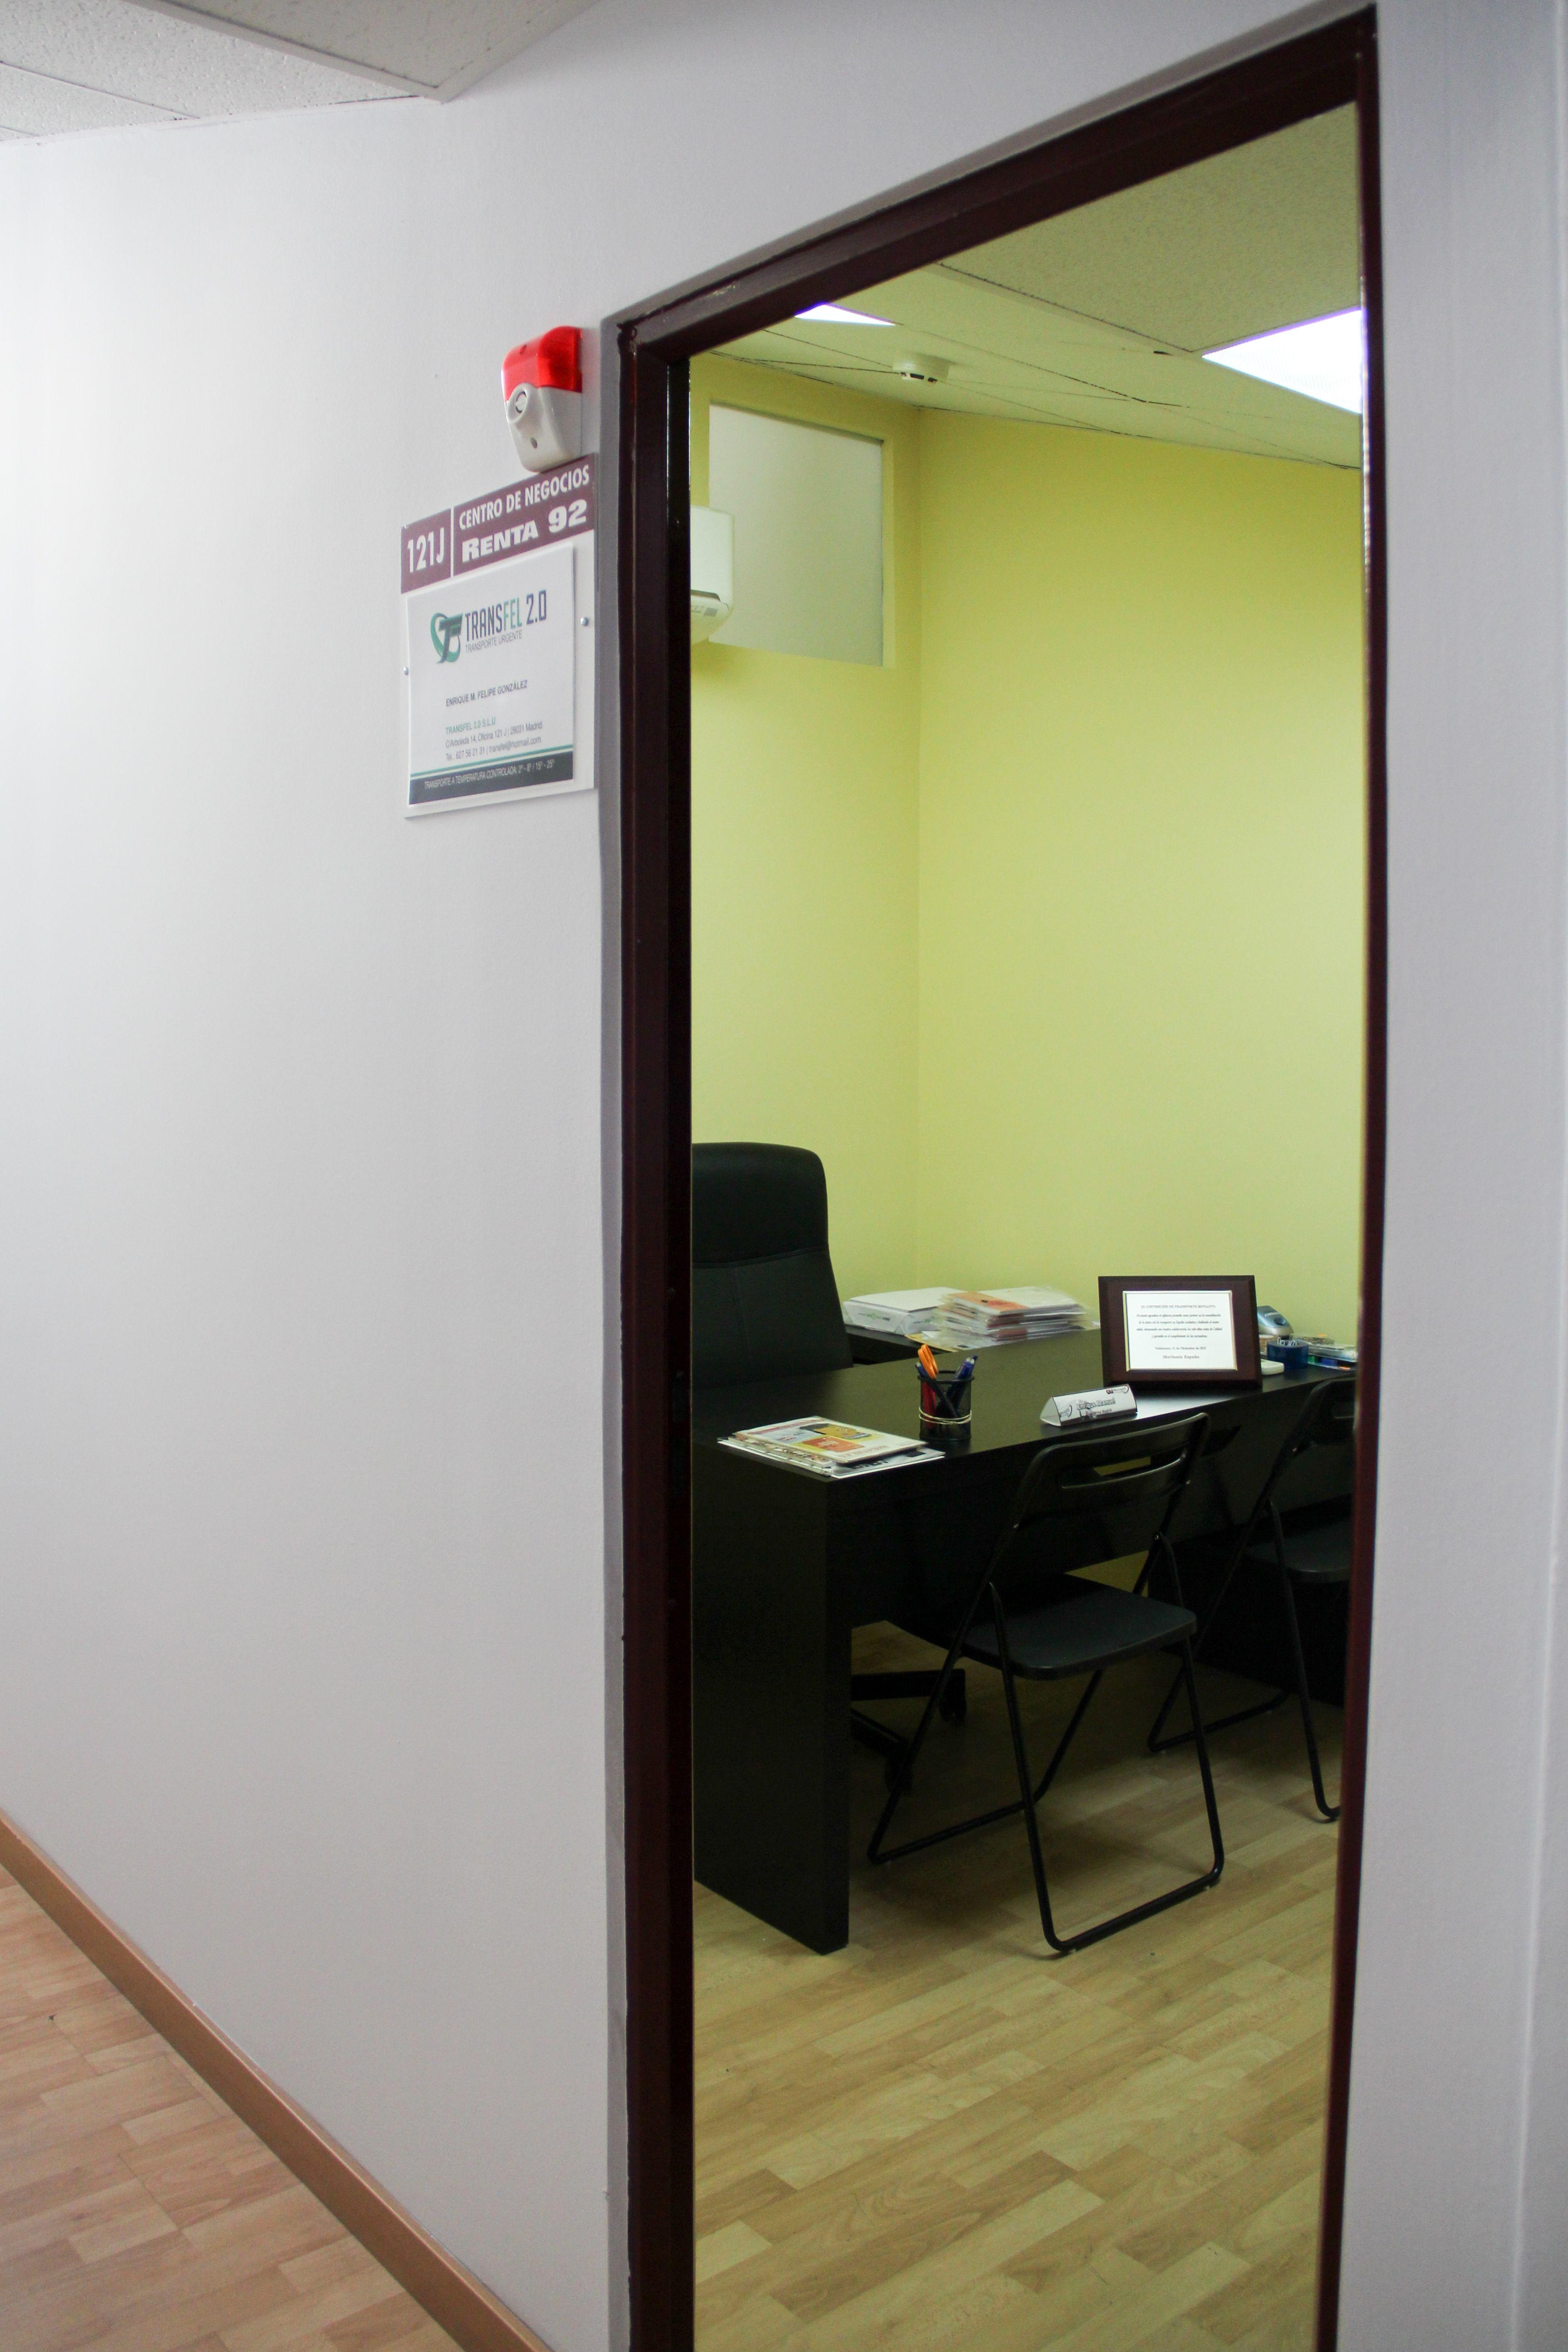 Entrada oficina Transfel 2.0